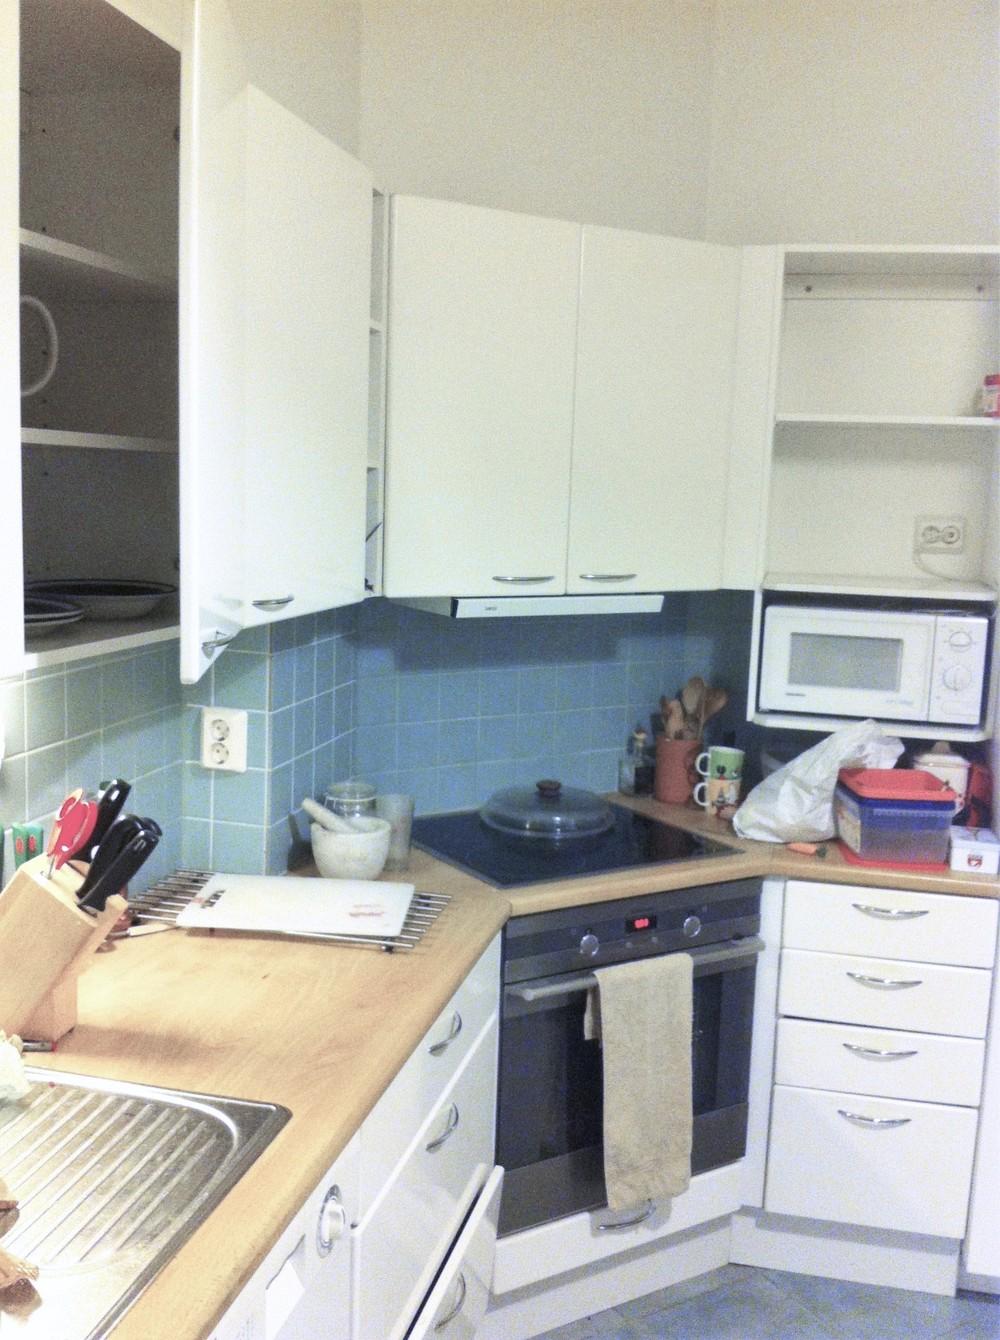 Vanha keittiö ennen remonttia.JPG